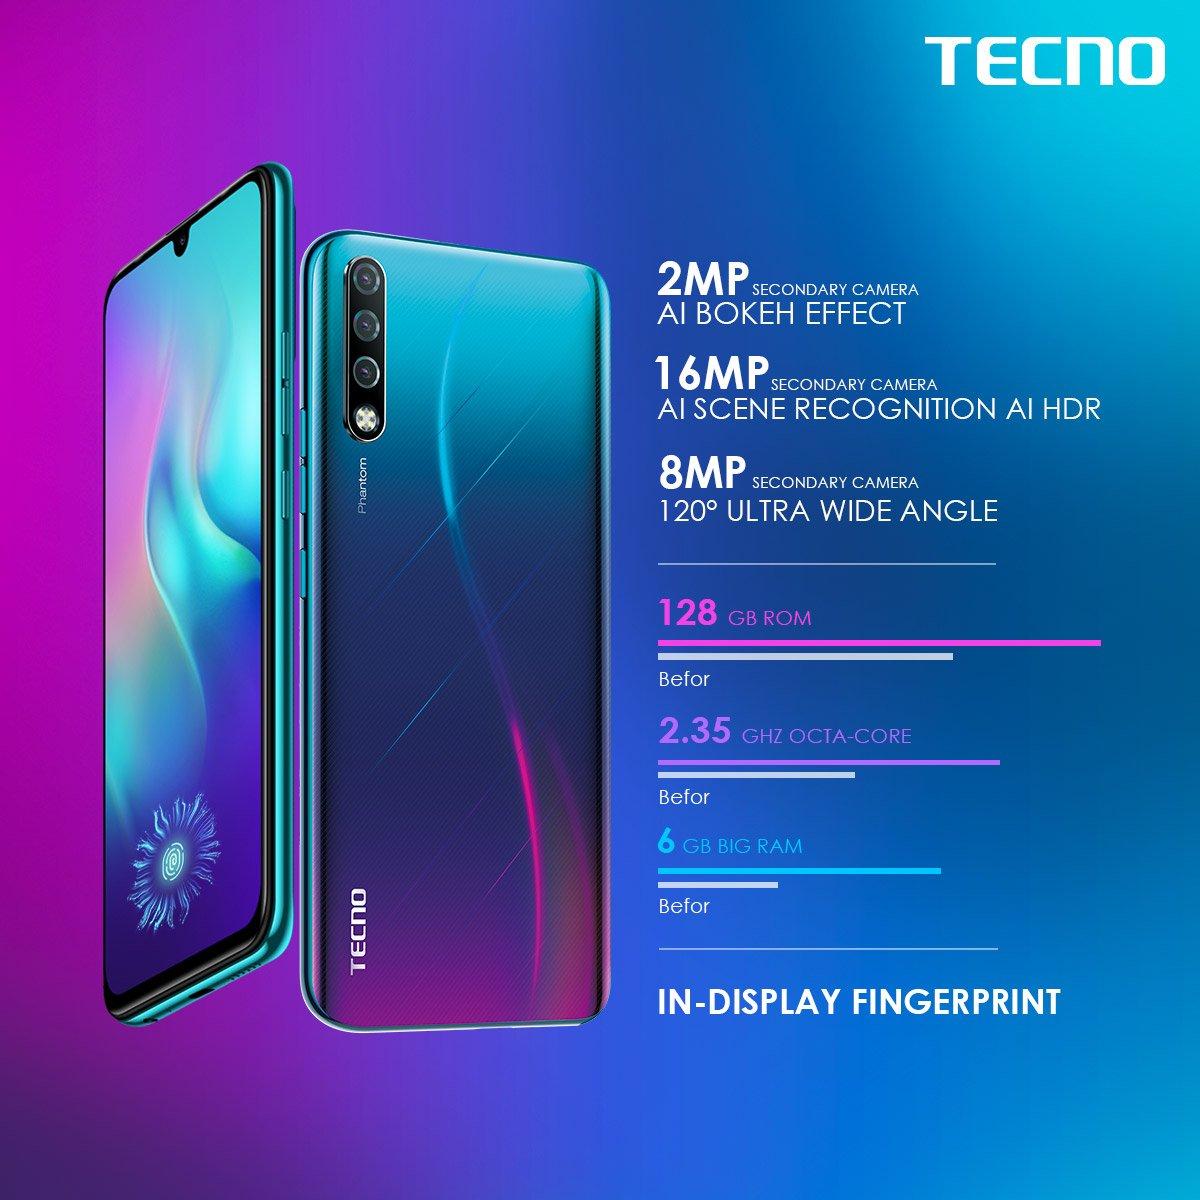 TECNO Mobile (@tecnomobile) | Twitter